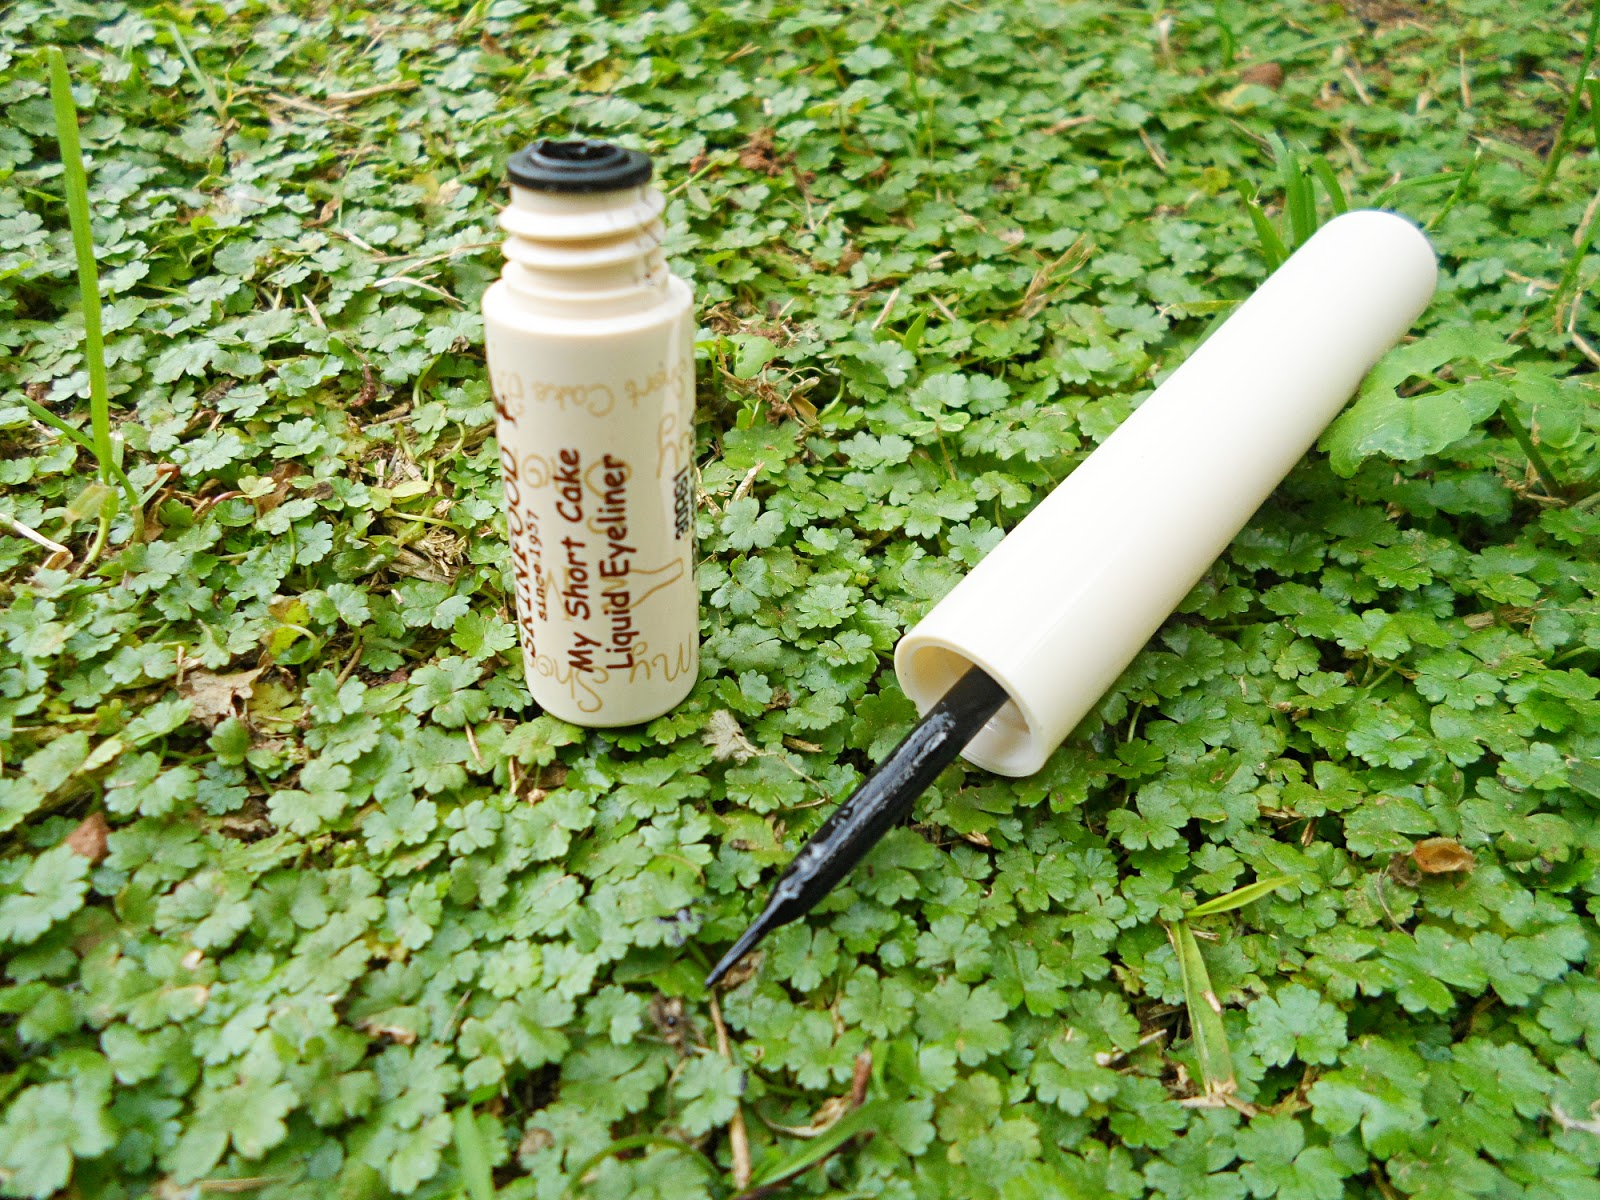 liz breygel beauty blogger review korean makeup w2beauty store product review pictures